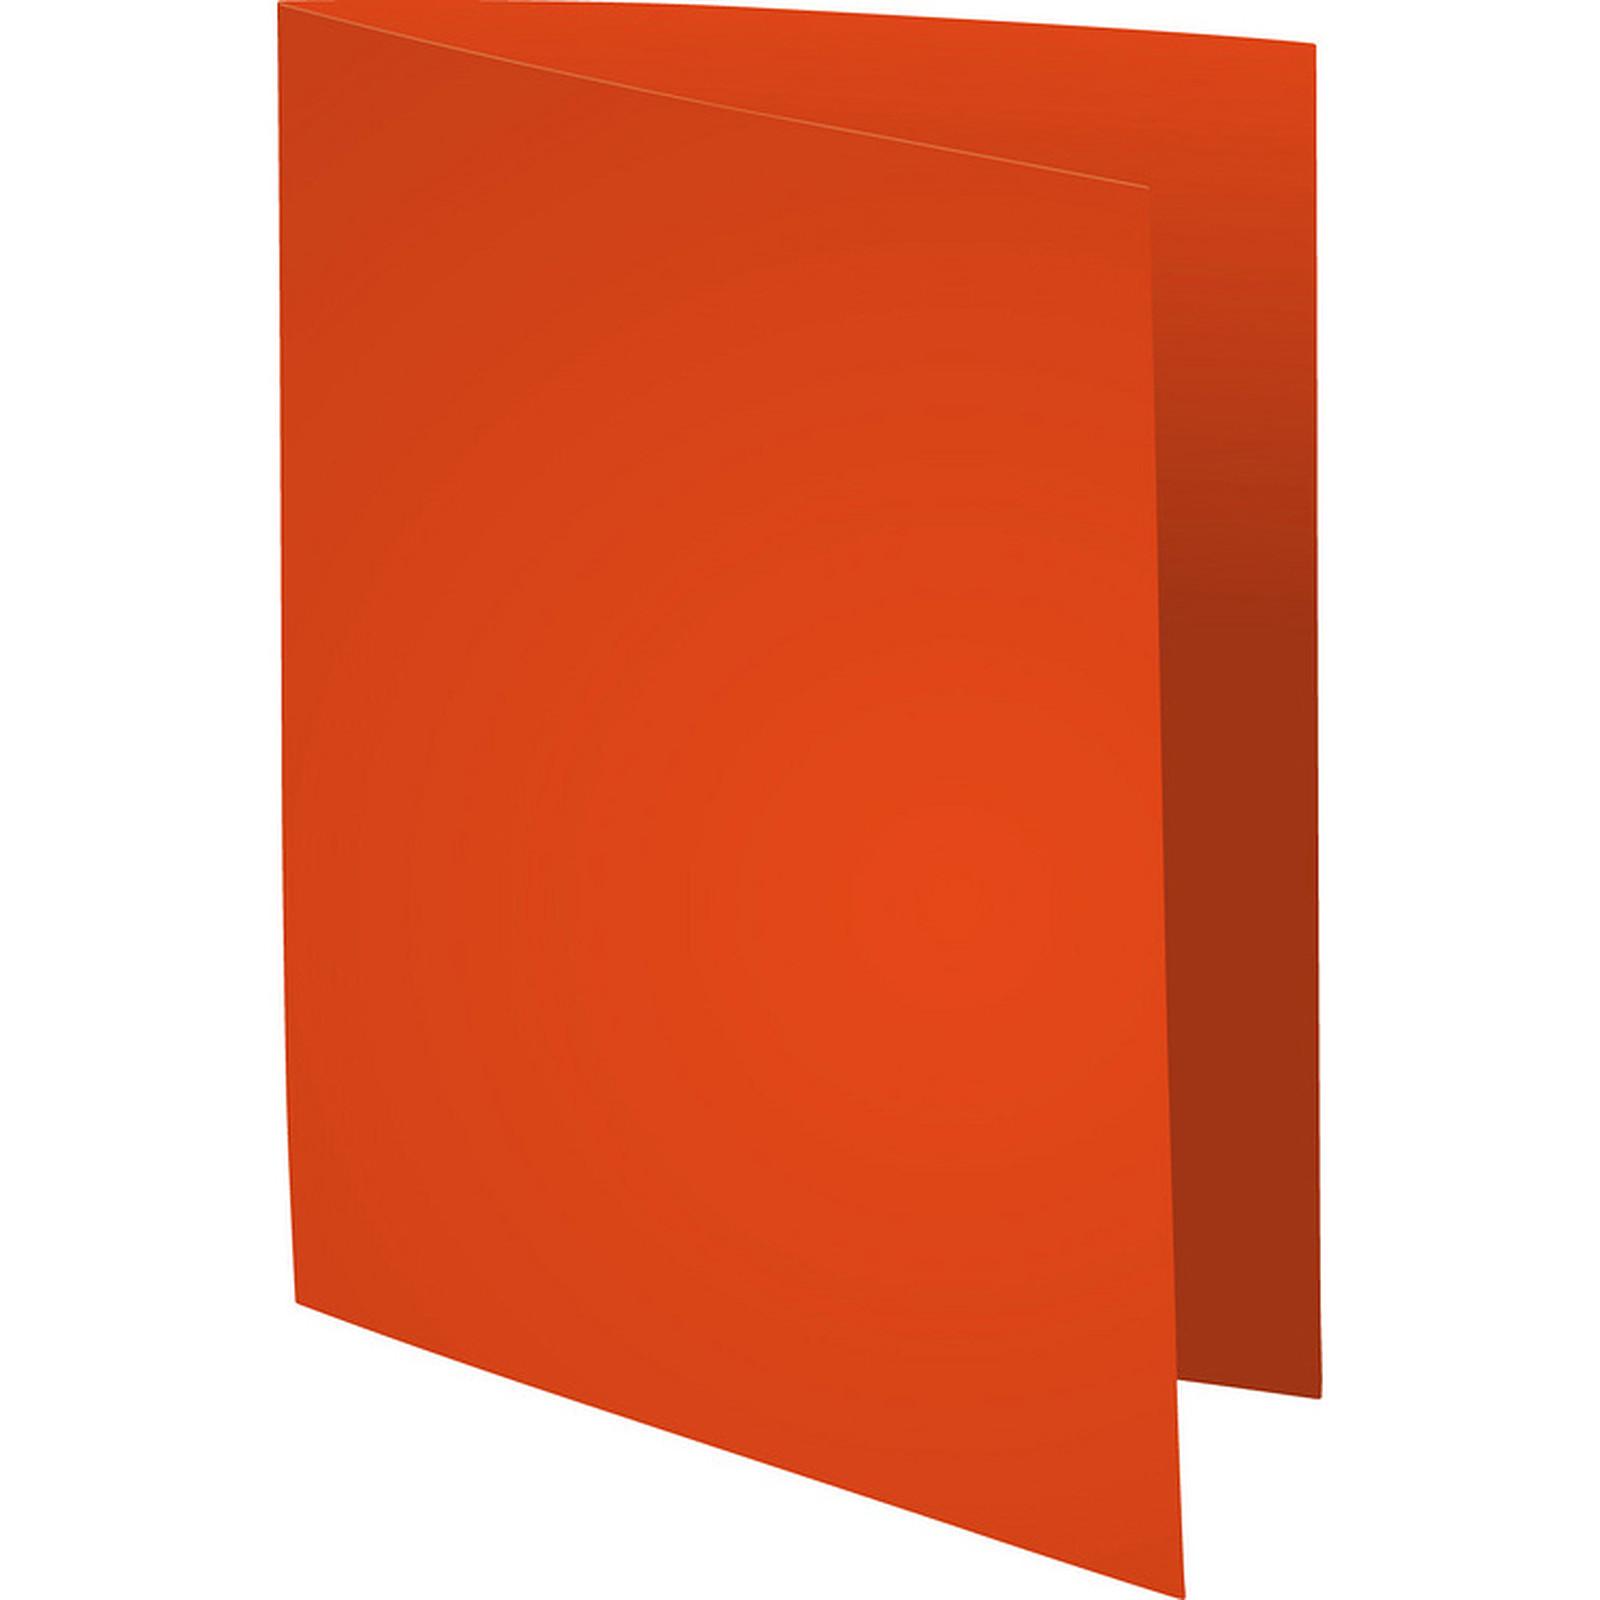 Exacompta Chemises Forever 170g Orange x 100